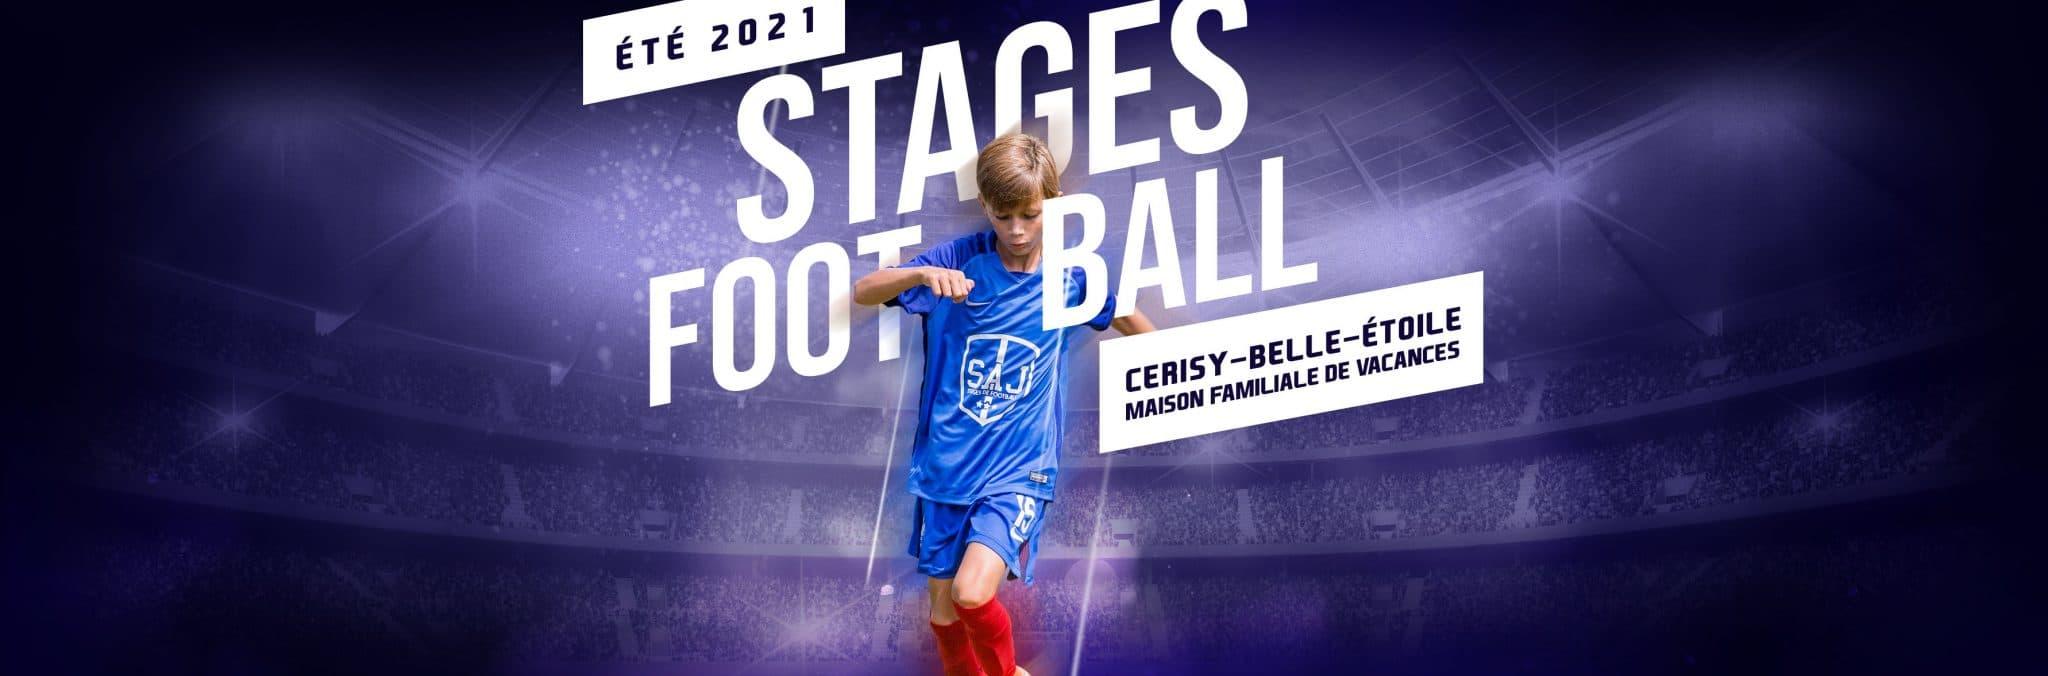 Stages football été 2021